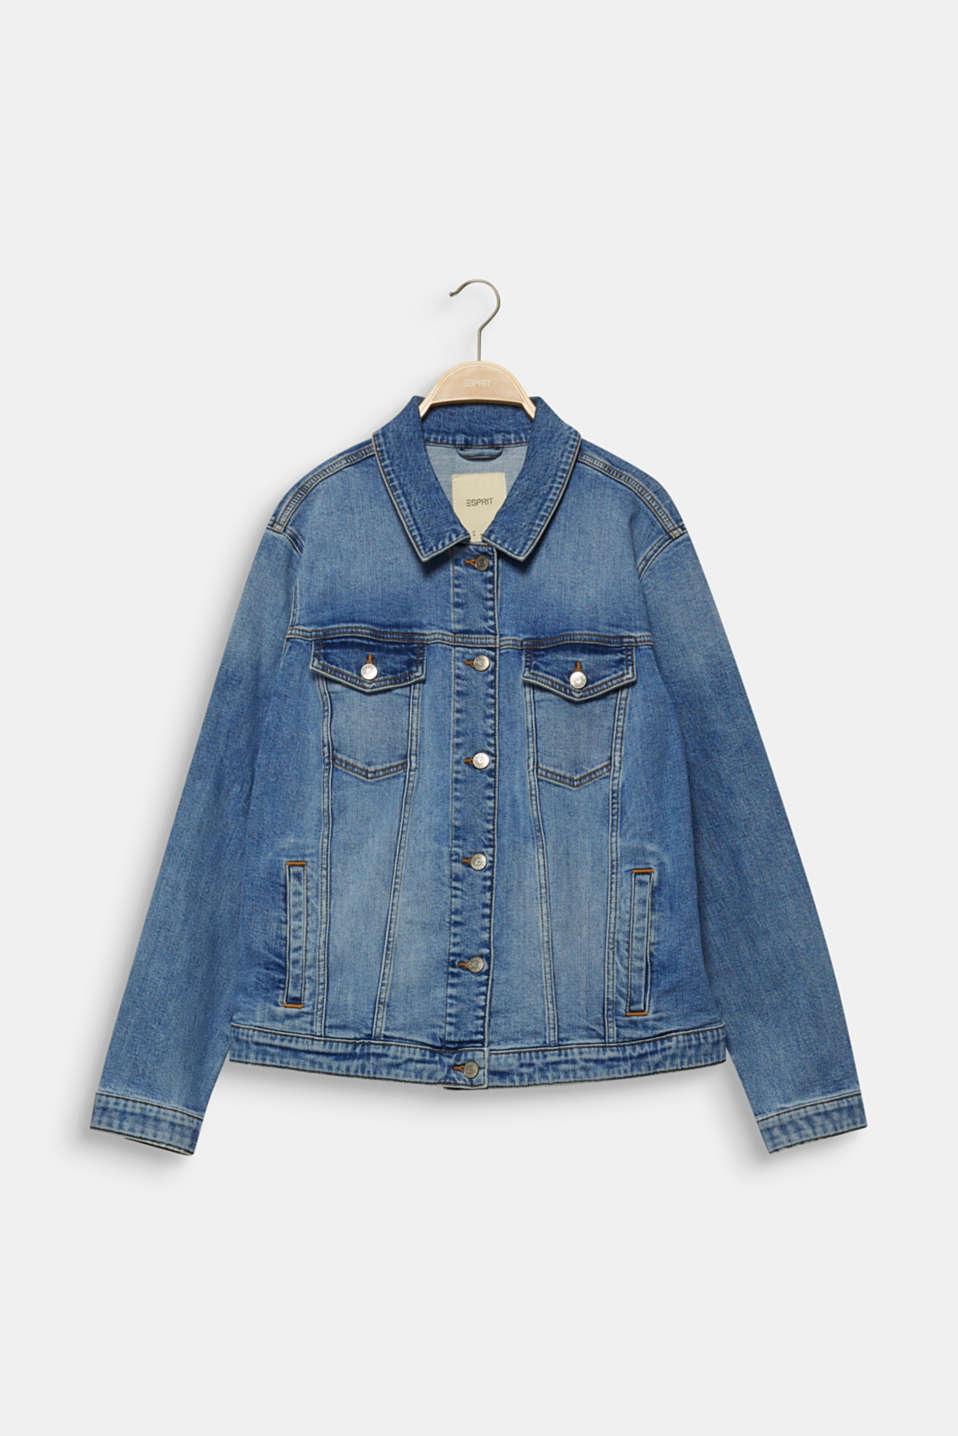 CURVY denim jacket in a basic style, BLUE MEDIUM WASH, detail image number 7